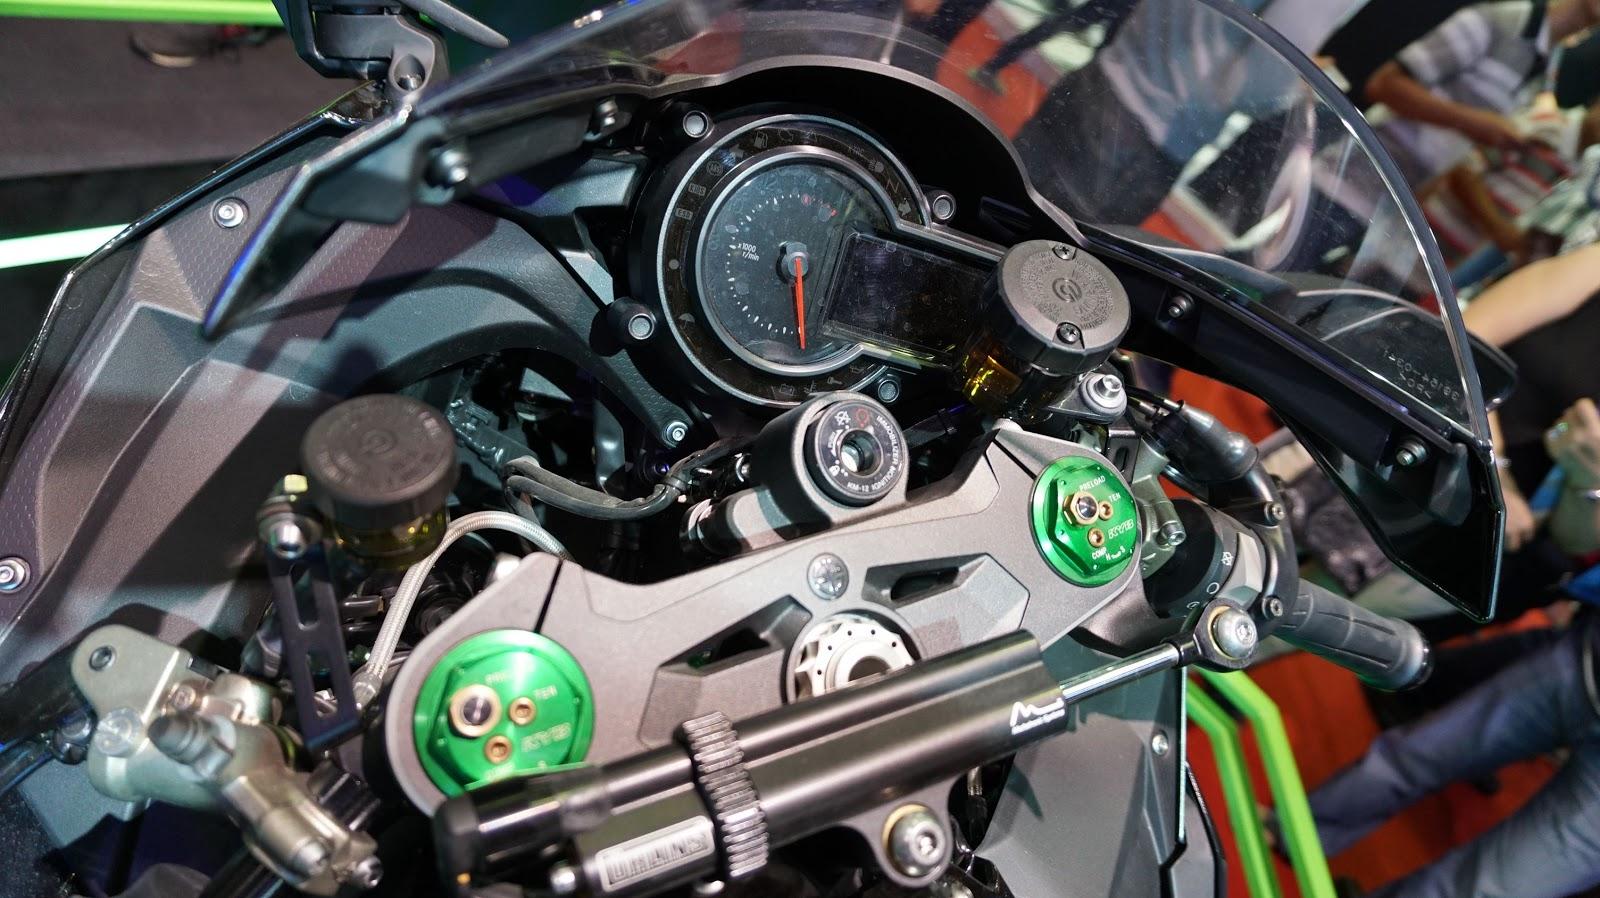 Cận cảnh siêu xe Kawasaki Ninja H2 tại VMS 2016